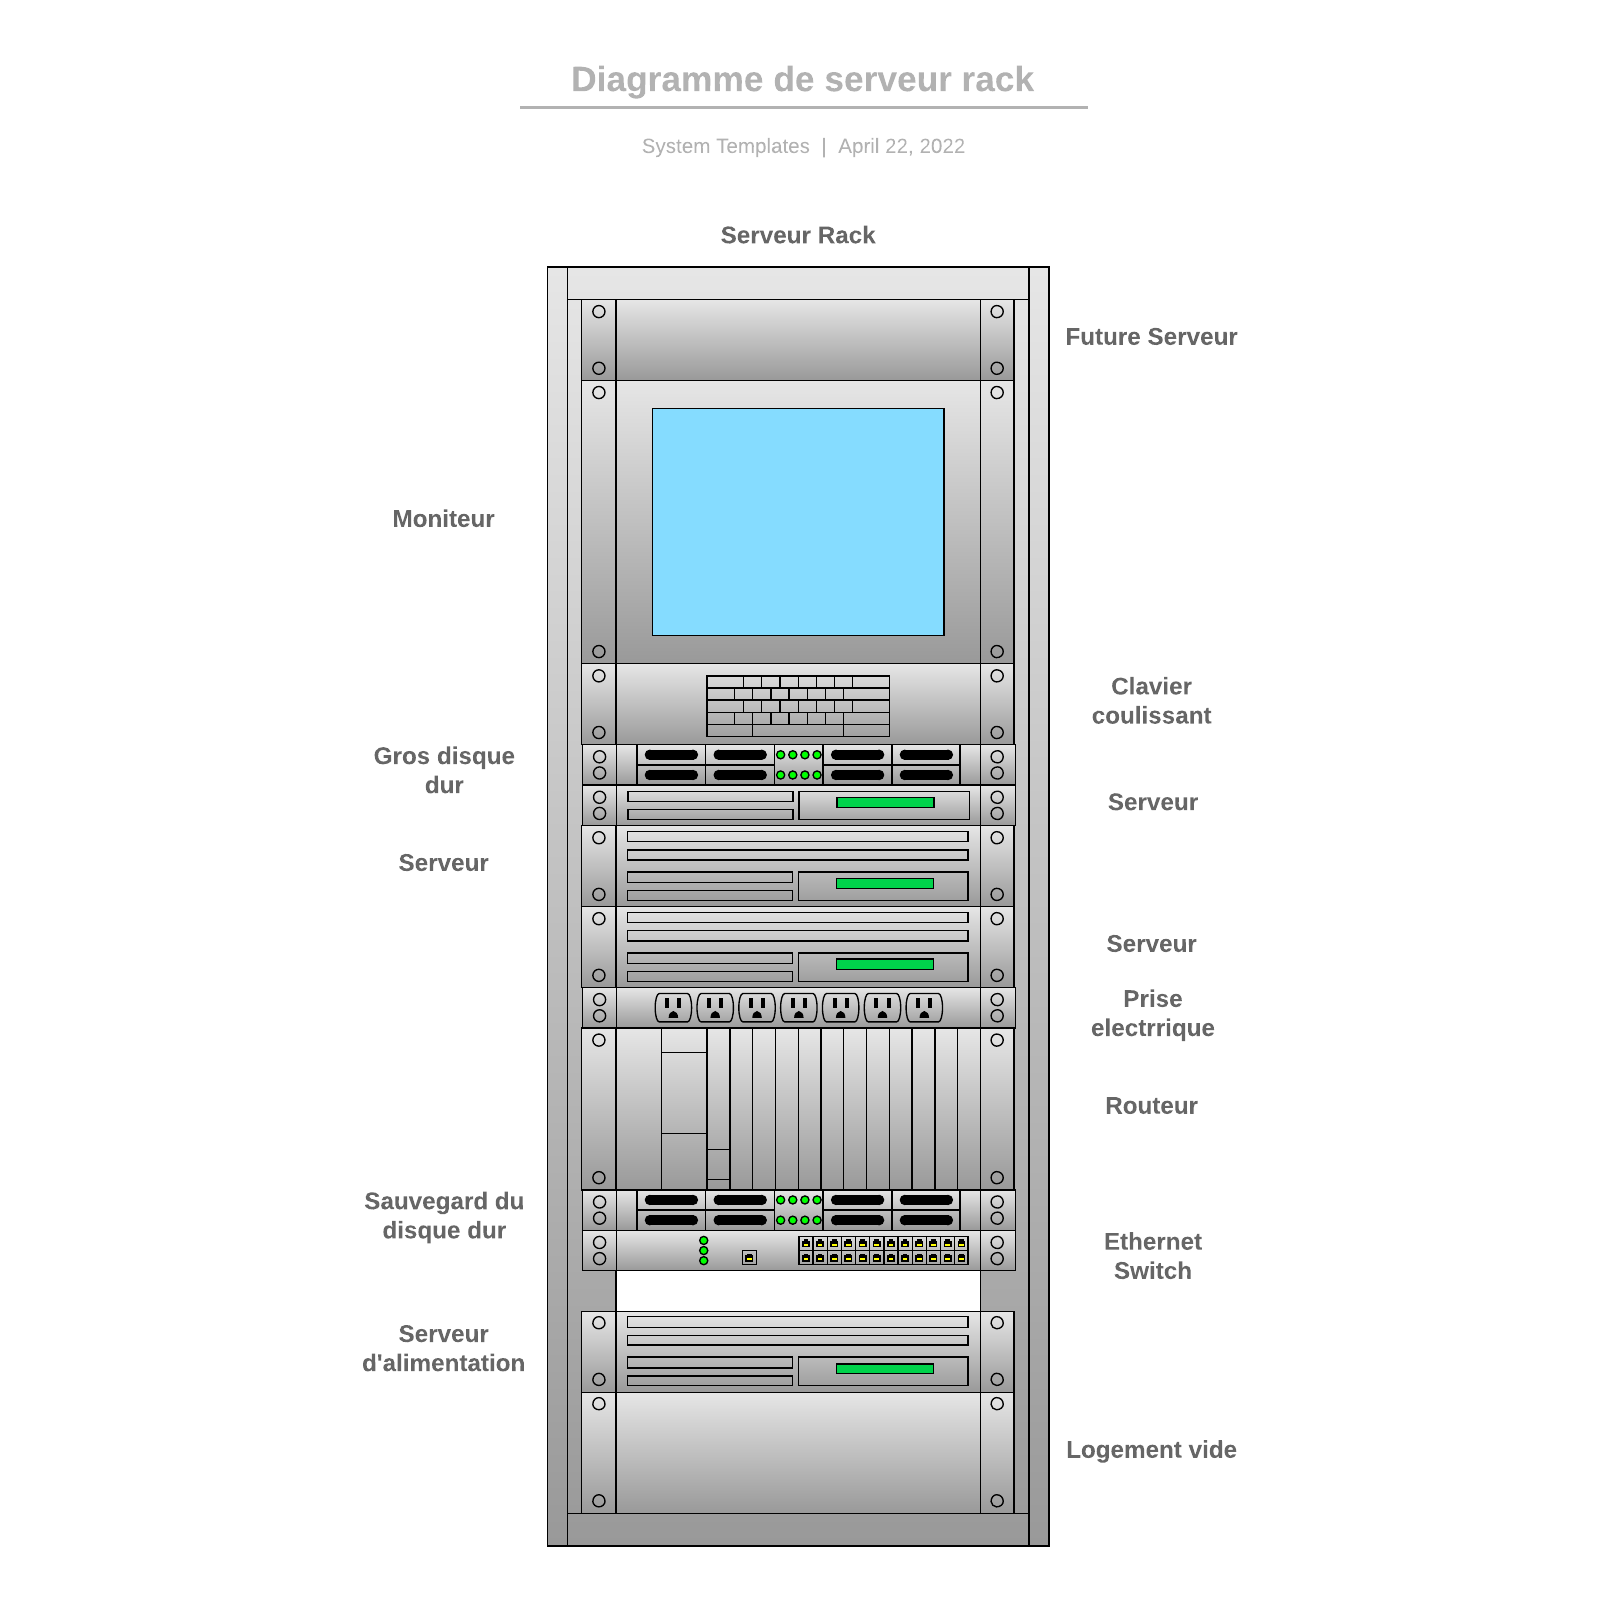 exemple de diagramme de montage en rack